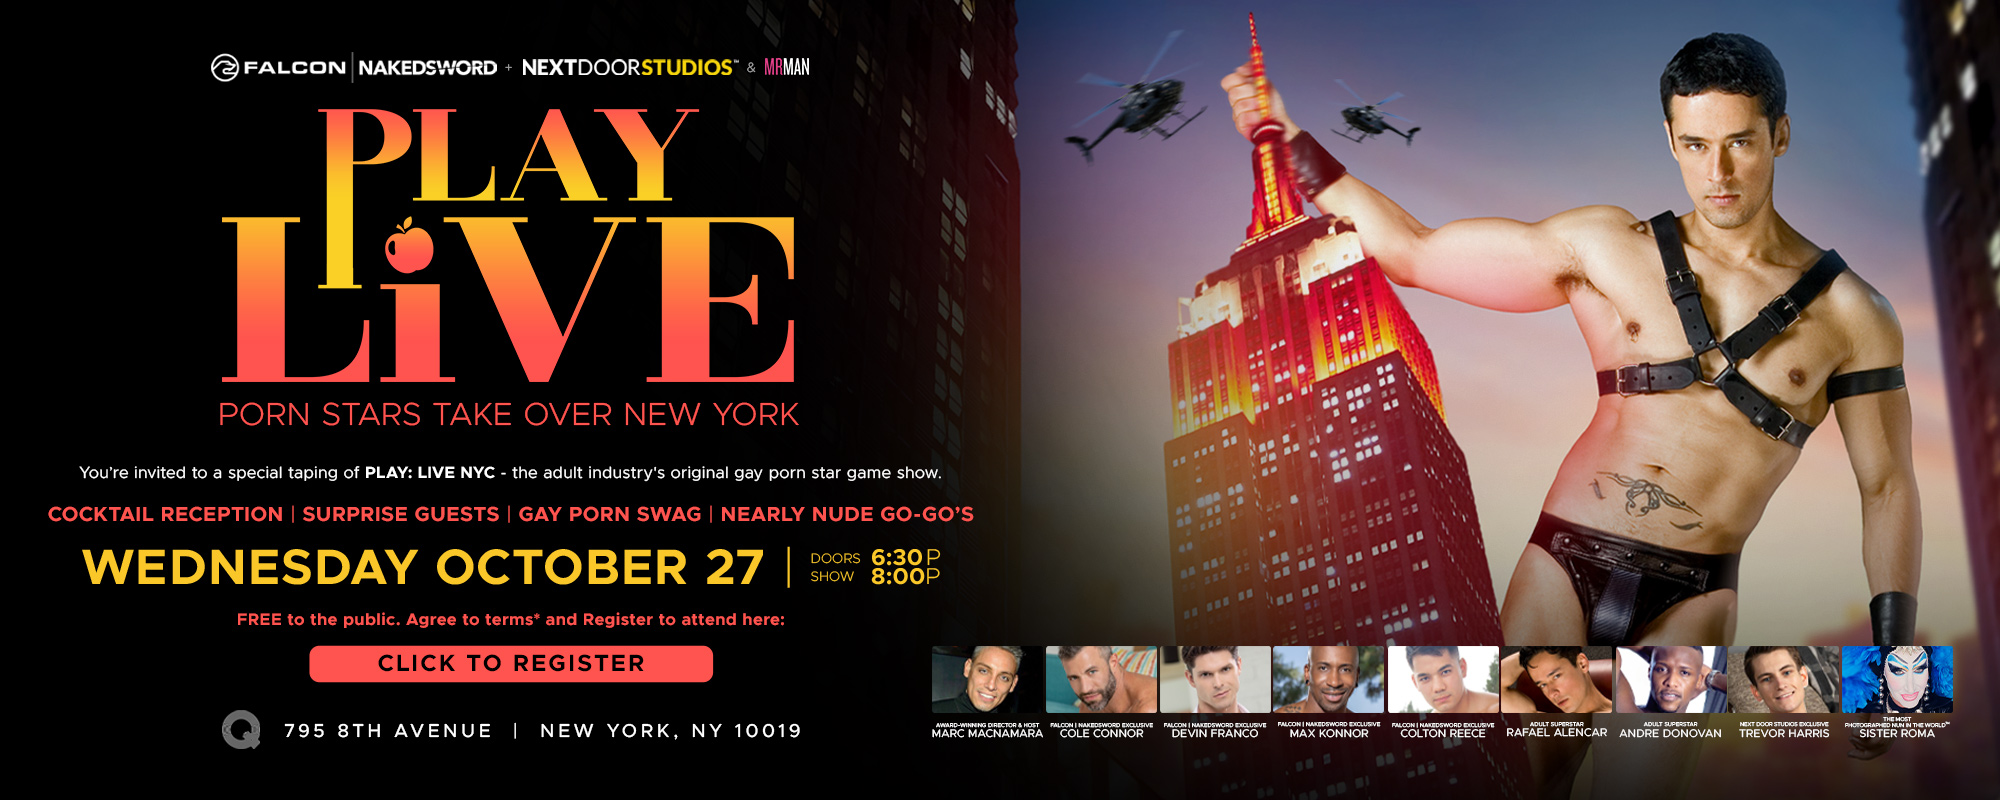 Play Live - Porn stars take over new york